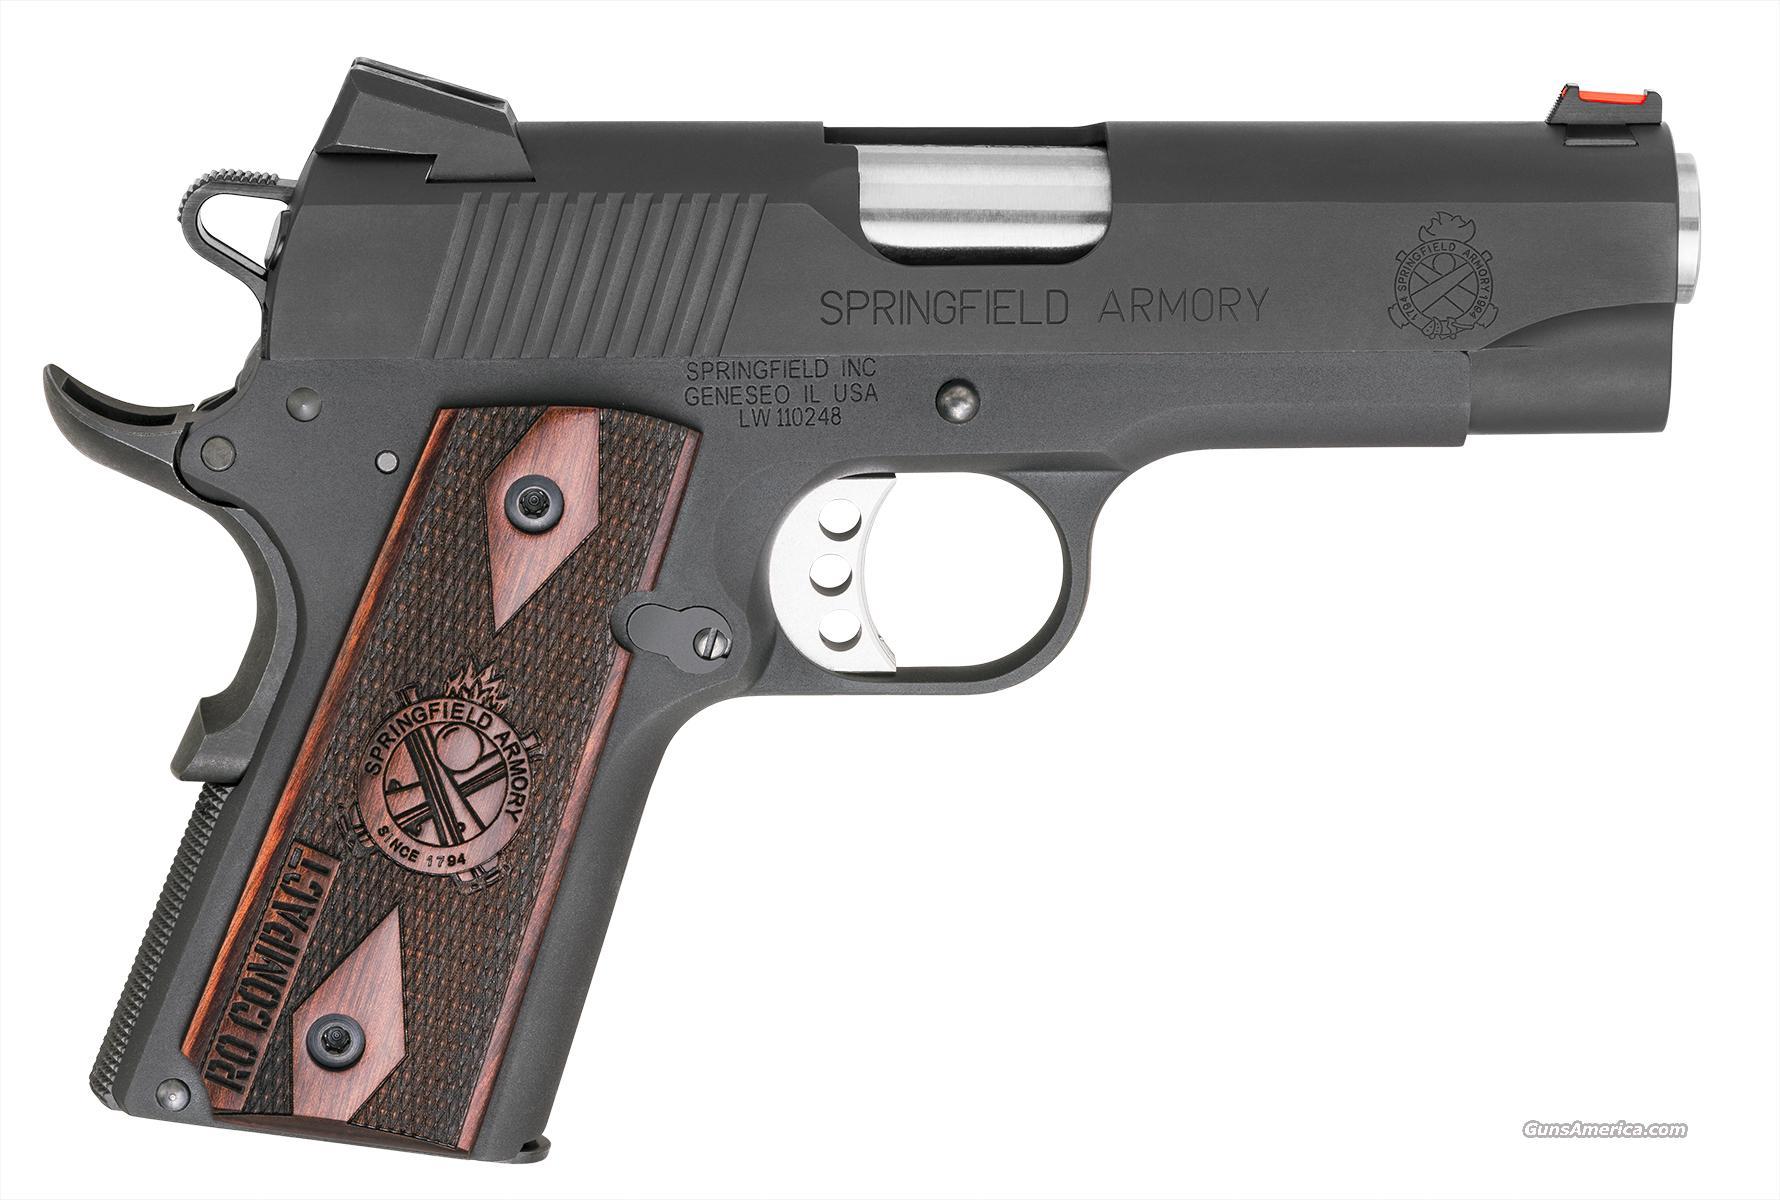 "Springfield Compact Range Officer LW 9mm 4"" Fiber Optic *NEW* PI9125LP  Guns > Pistols > Springfield Armory Pistols > 1911 Type"